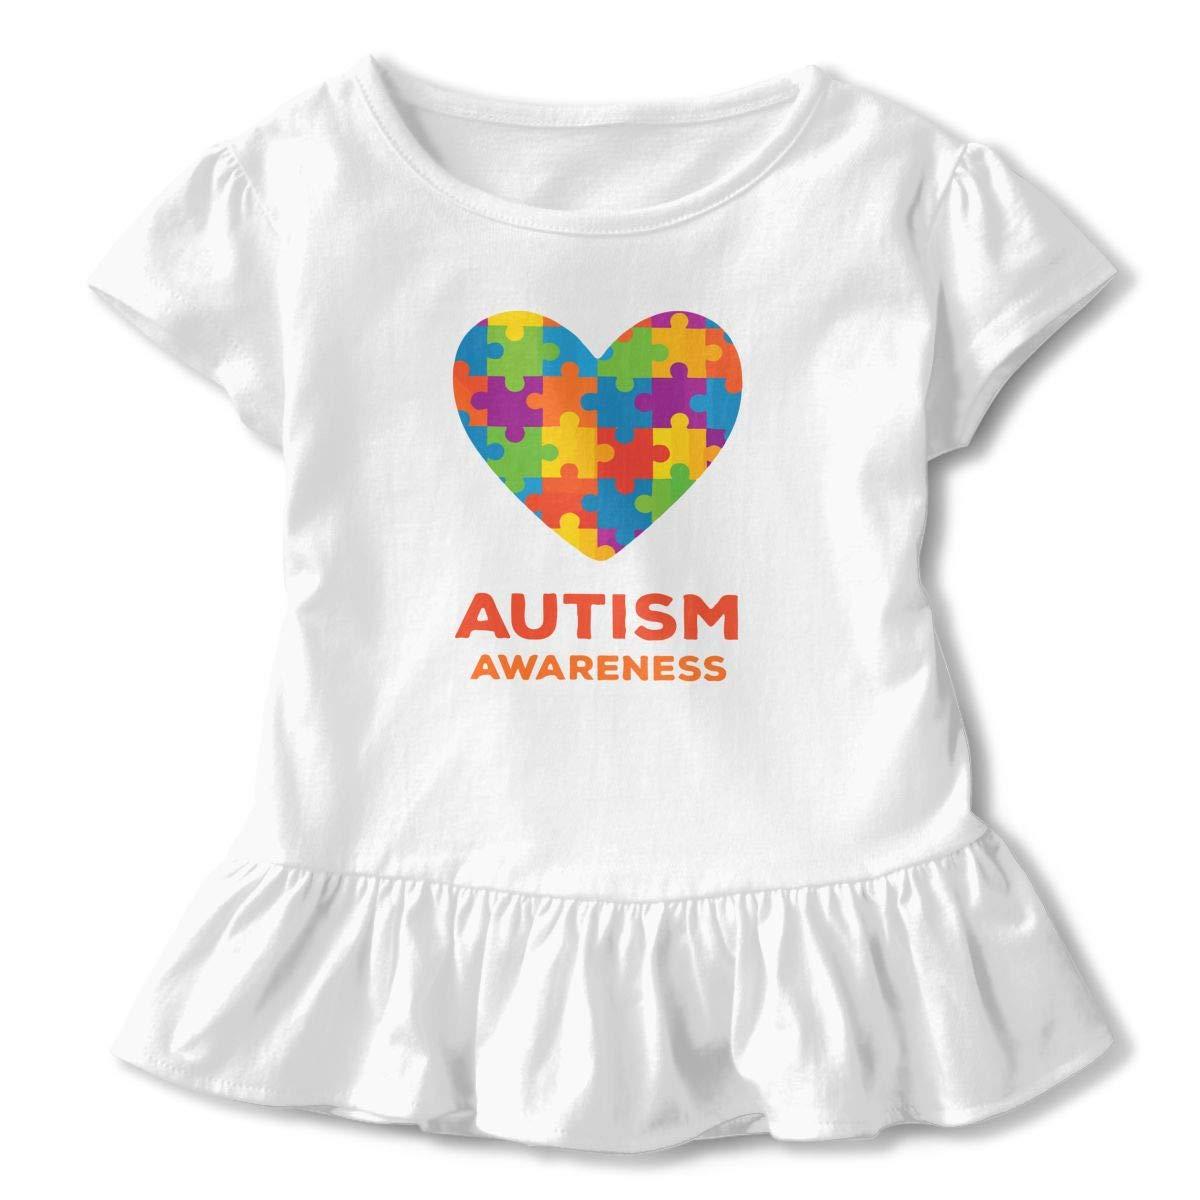 Cheng Jian Bo Autism Awareness Support Toddler Girls T Shirt Kids Cotton Short Sleeve Ruffle Tee